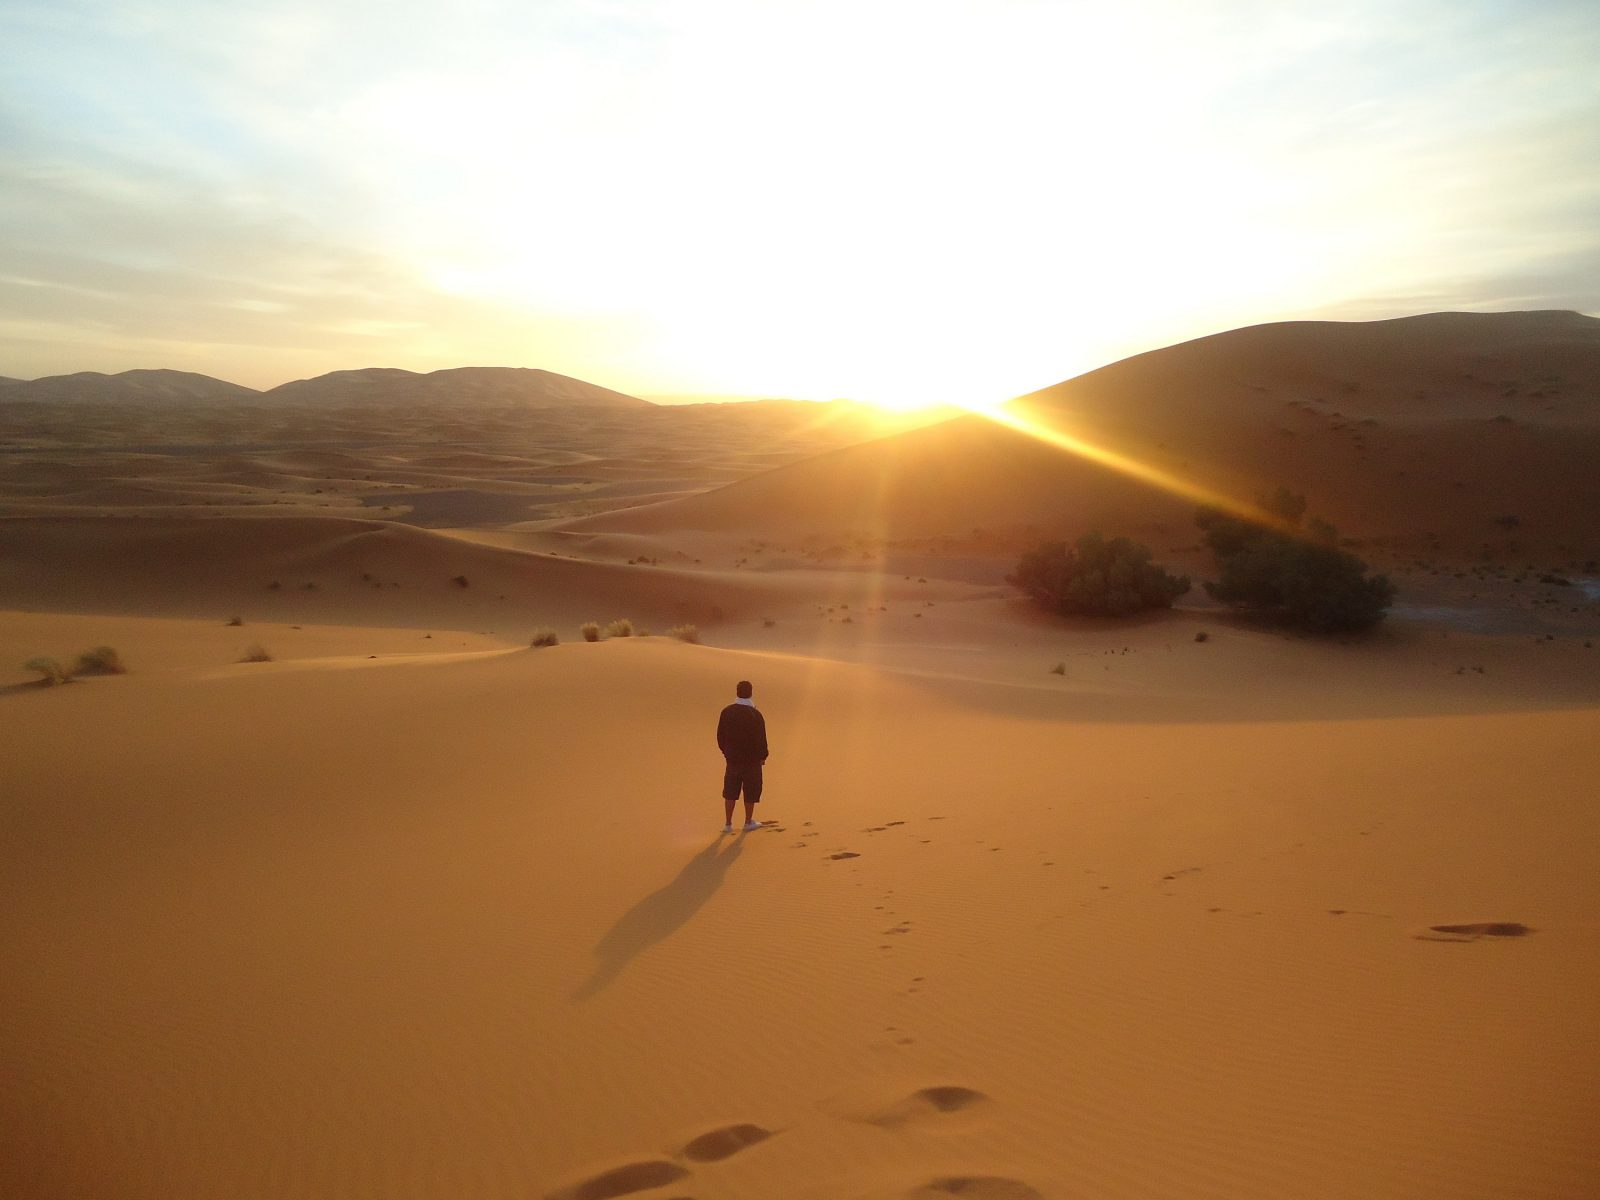 backlit-dawn-desert-774835